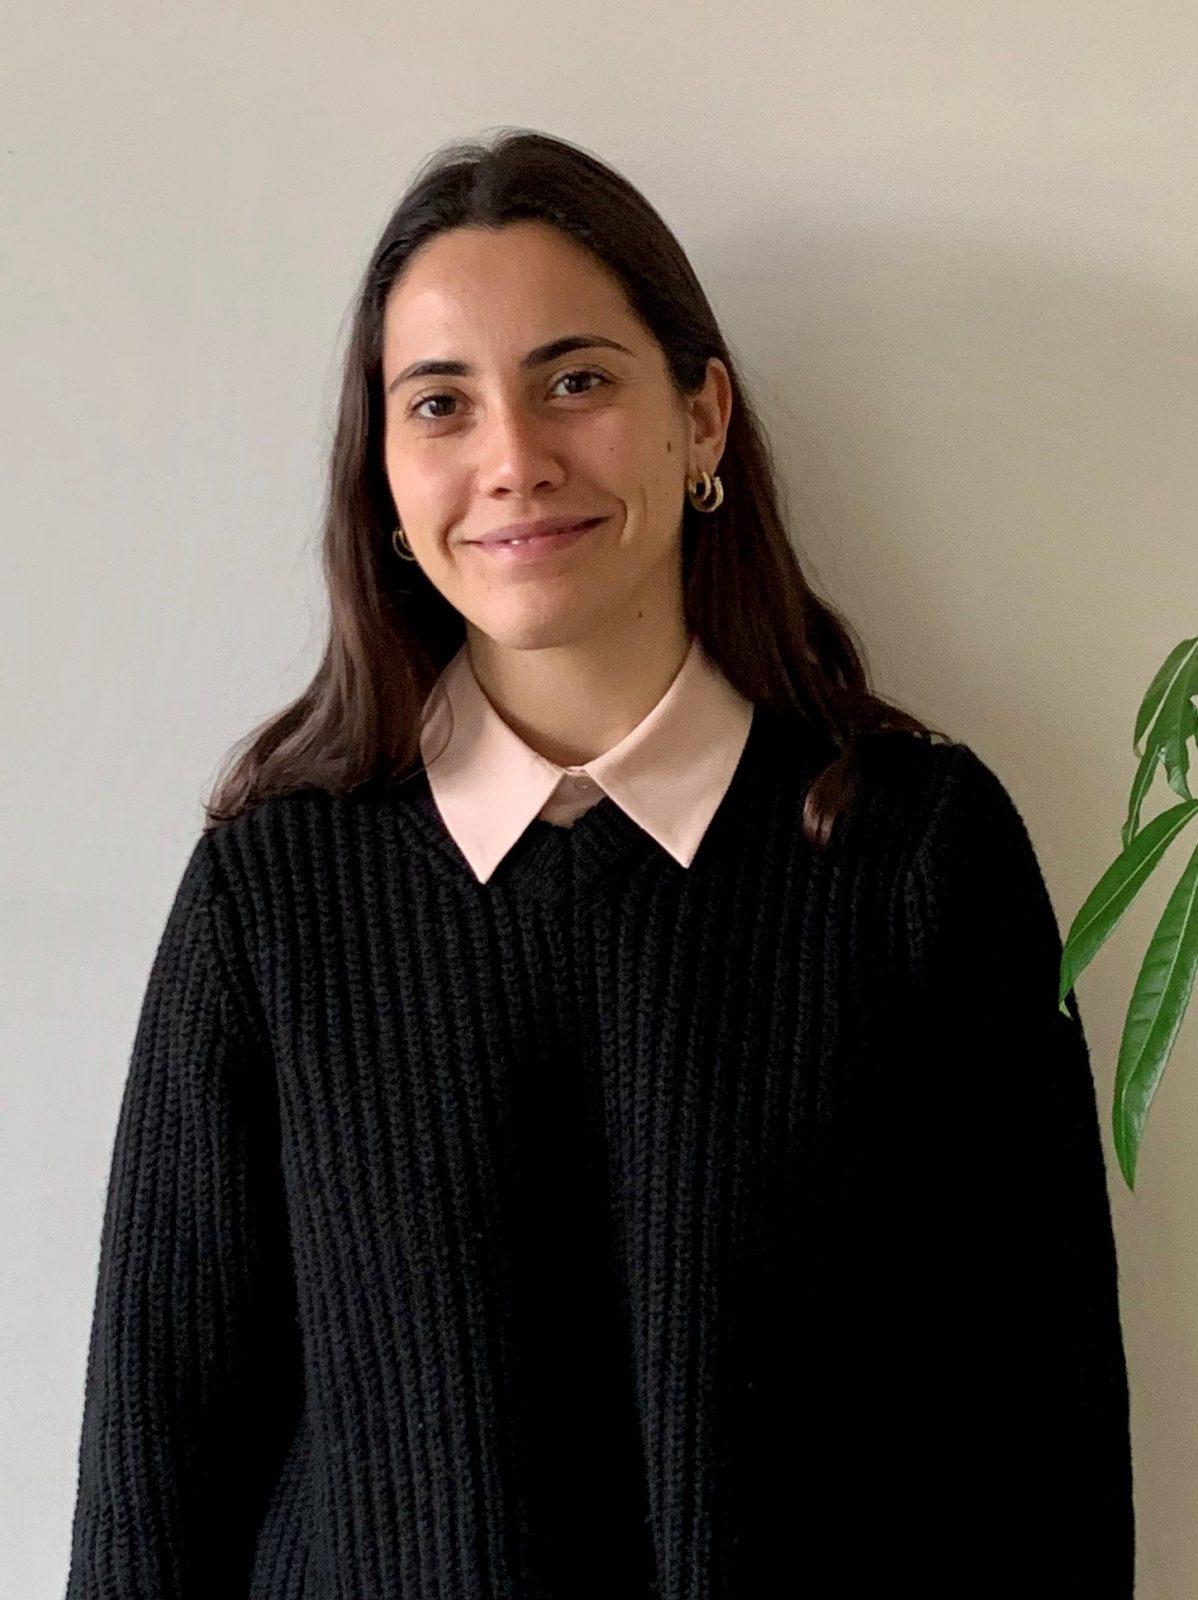 Eugenia Lenzi